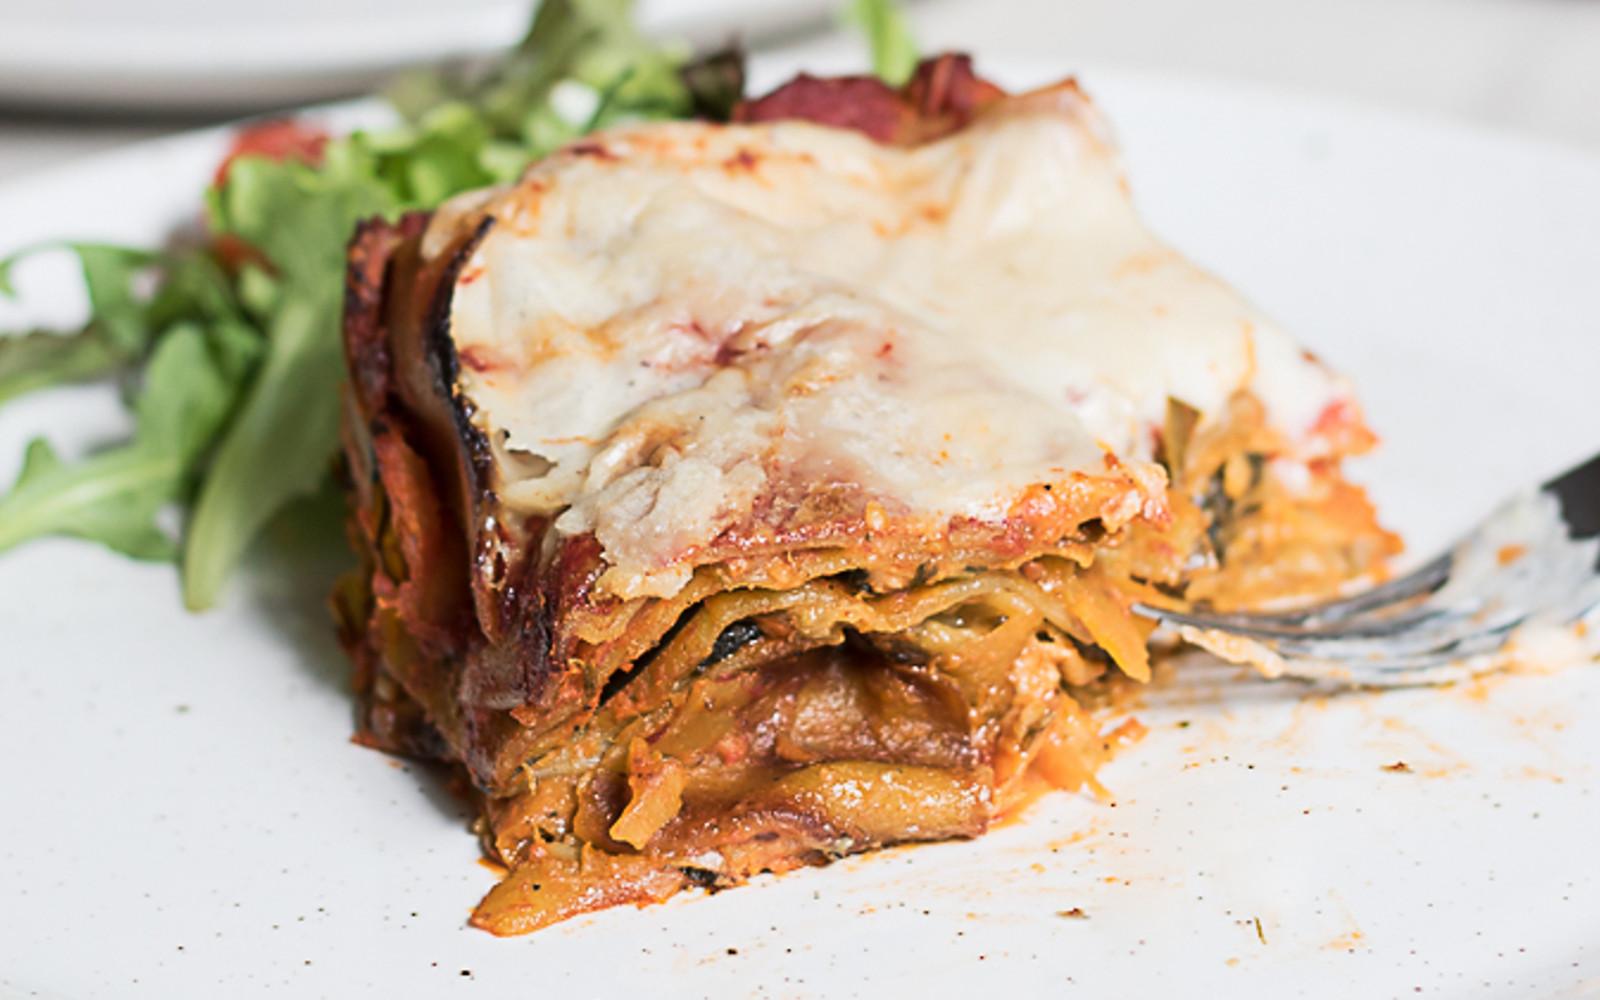 Eggplant Lasagna Vegan  Tomato Eggplant Lasagna With Cashew Mozzarella [Vegan